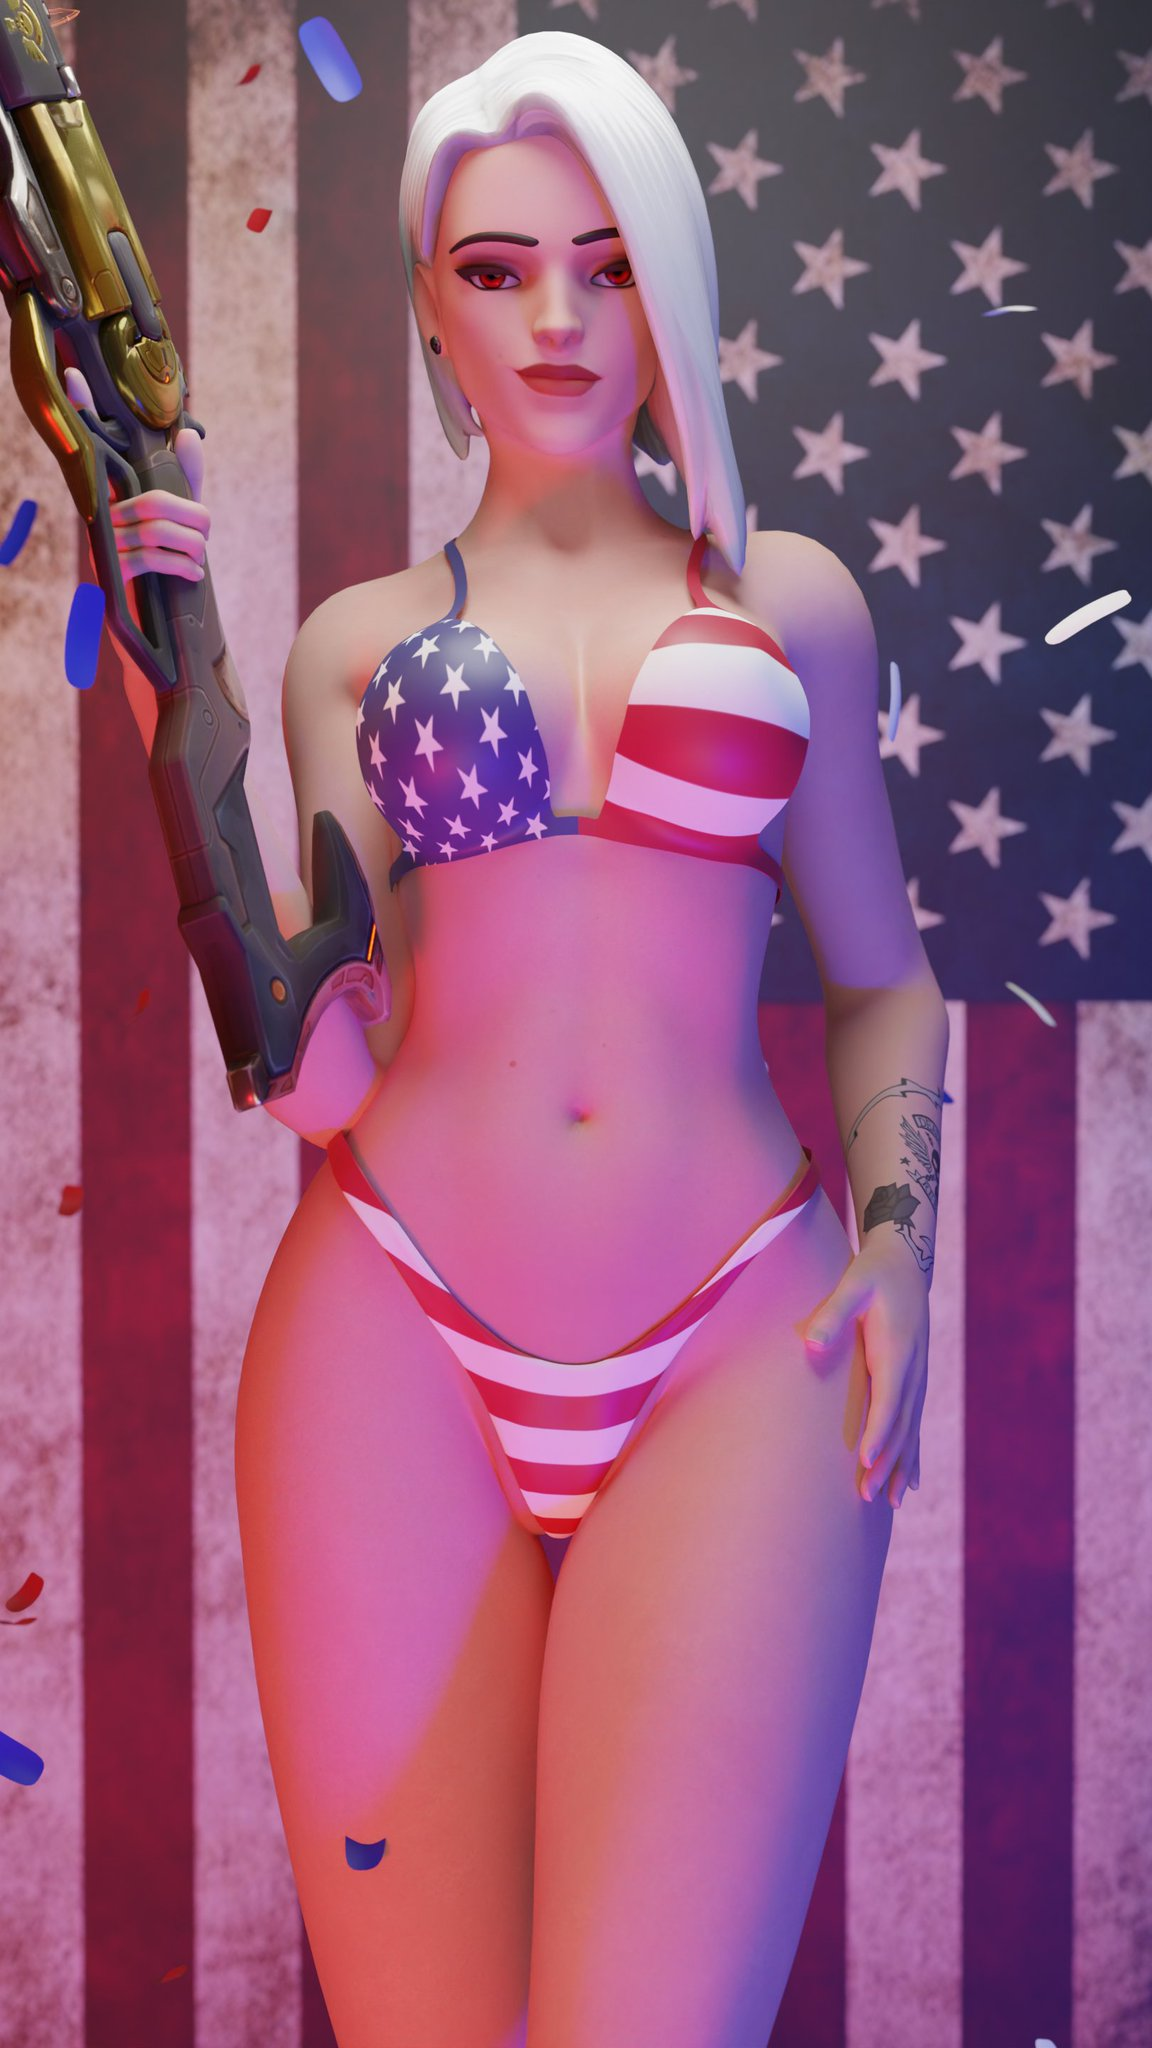 ashe-game-porn-–-looking-at-viewer,-bikini.